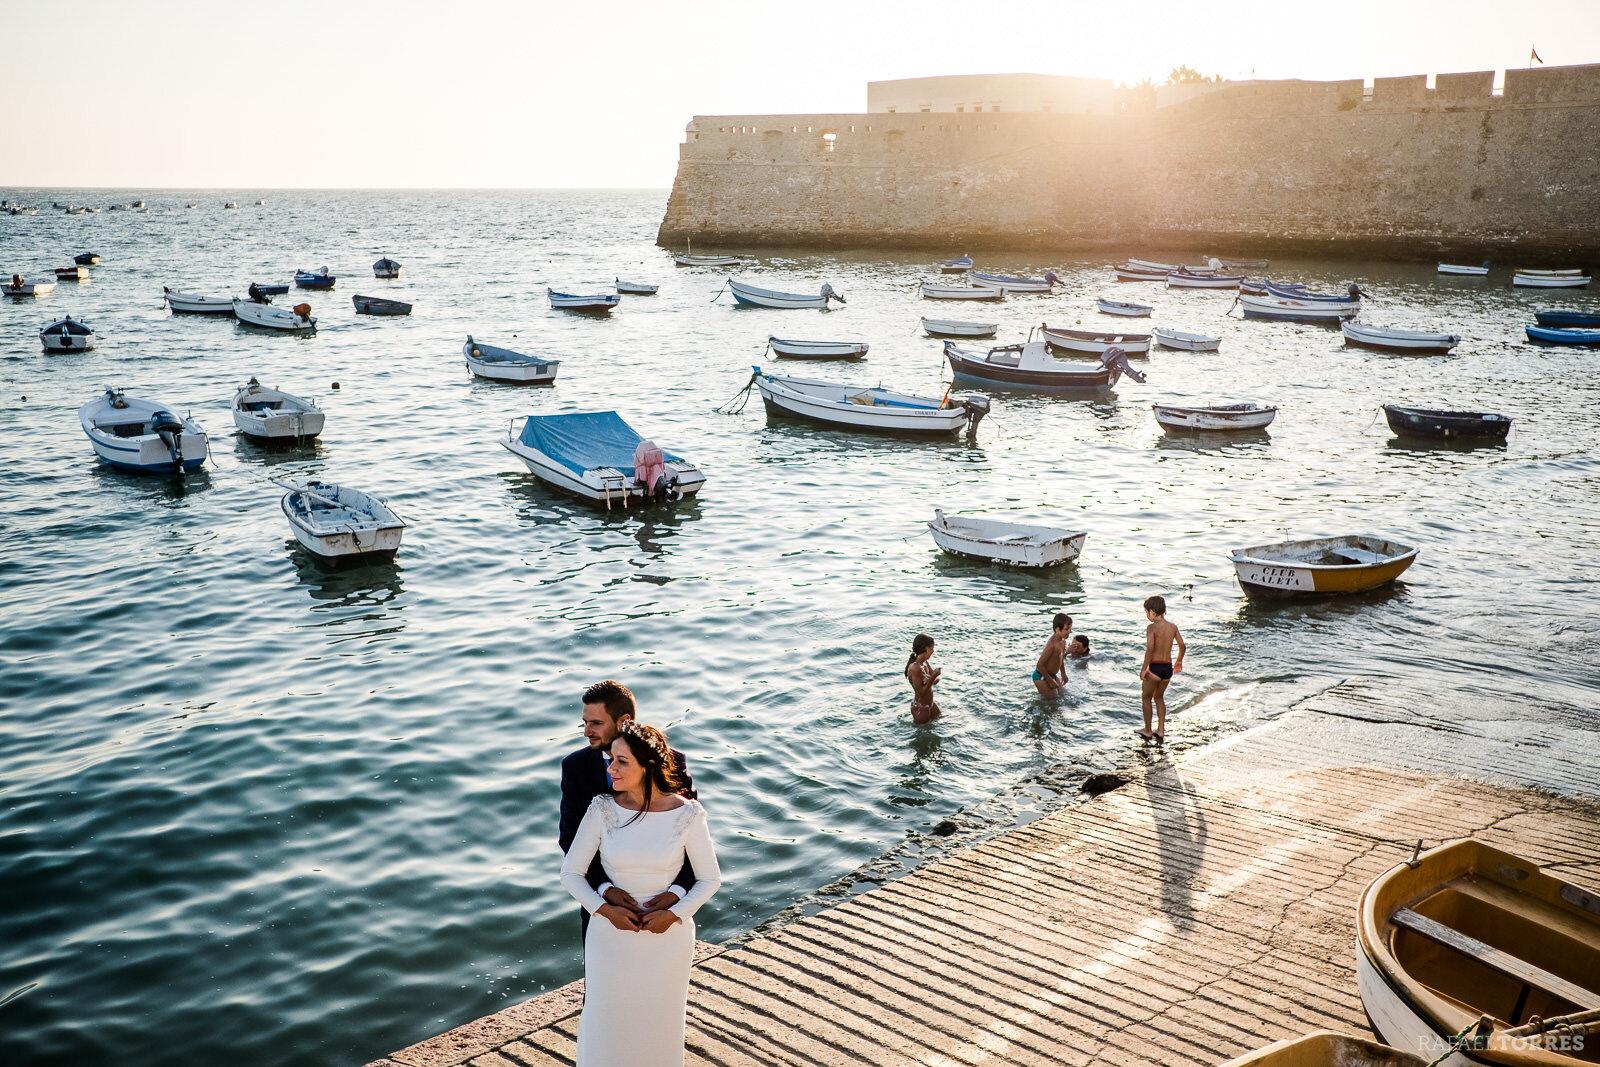 postboda-cadiz-fotografo-boda-diferente-wedding-176.jpg